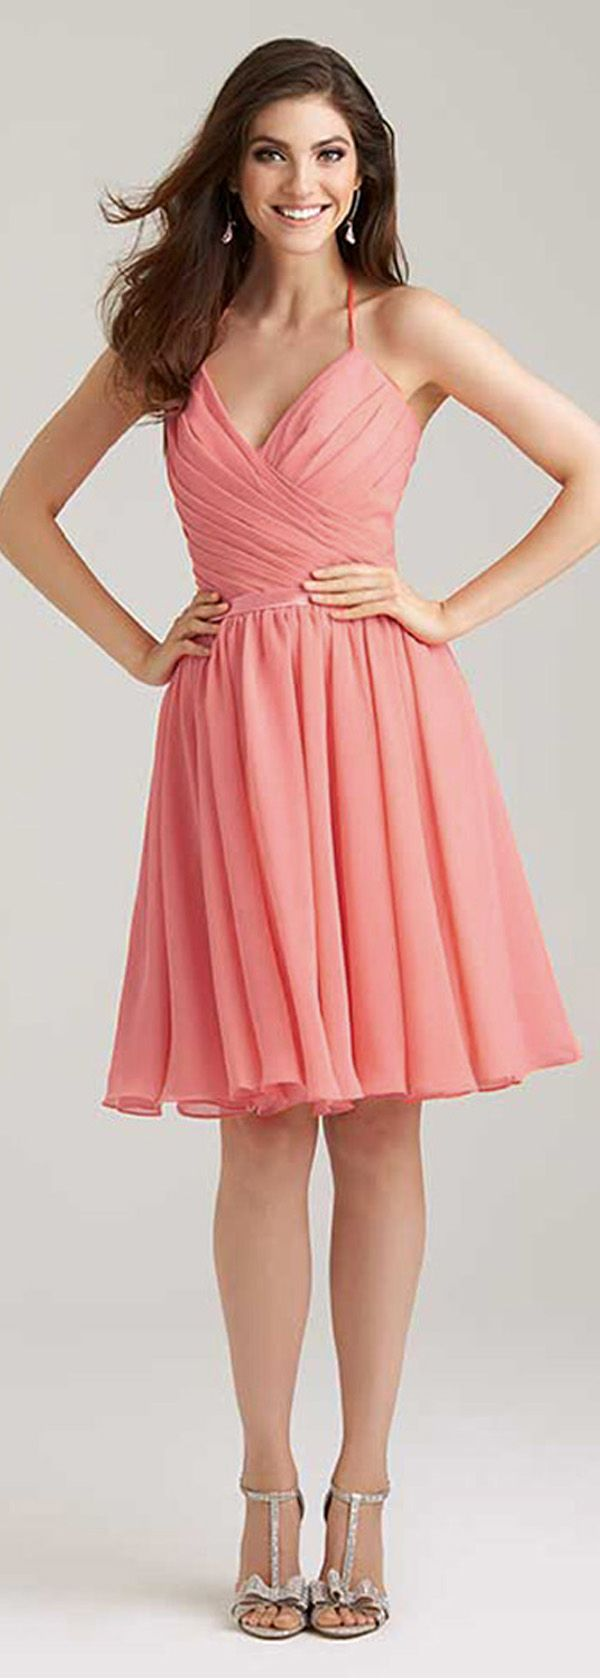 101 mejores imágenes de A-line Dress en Pinterest | Vestidos de ...